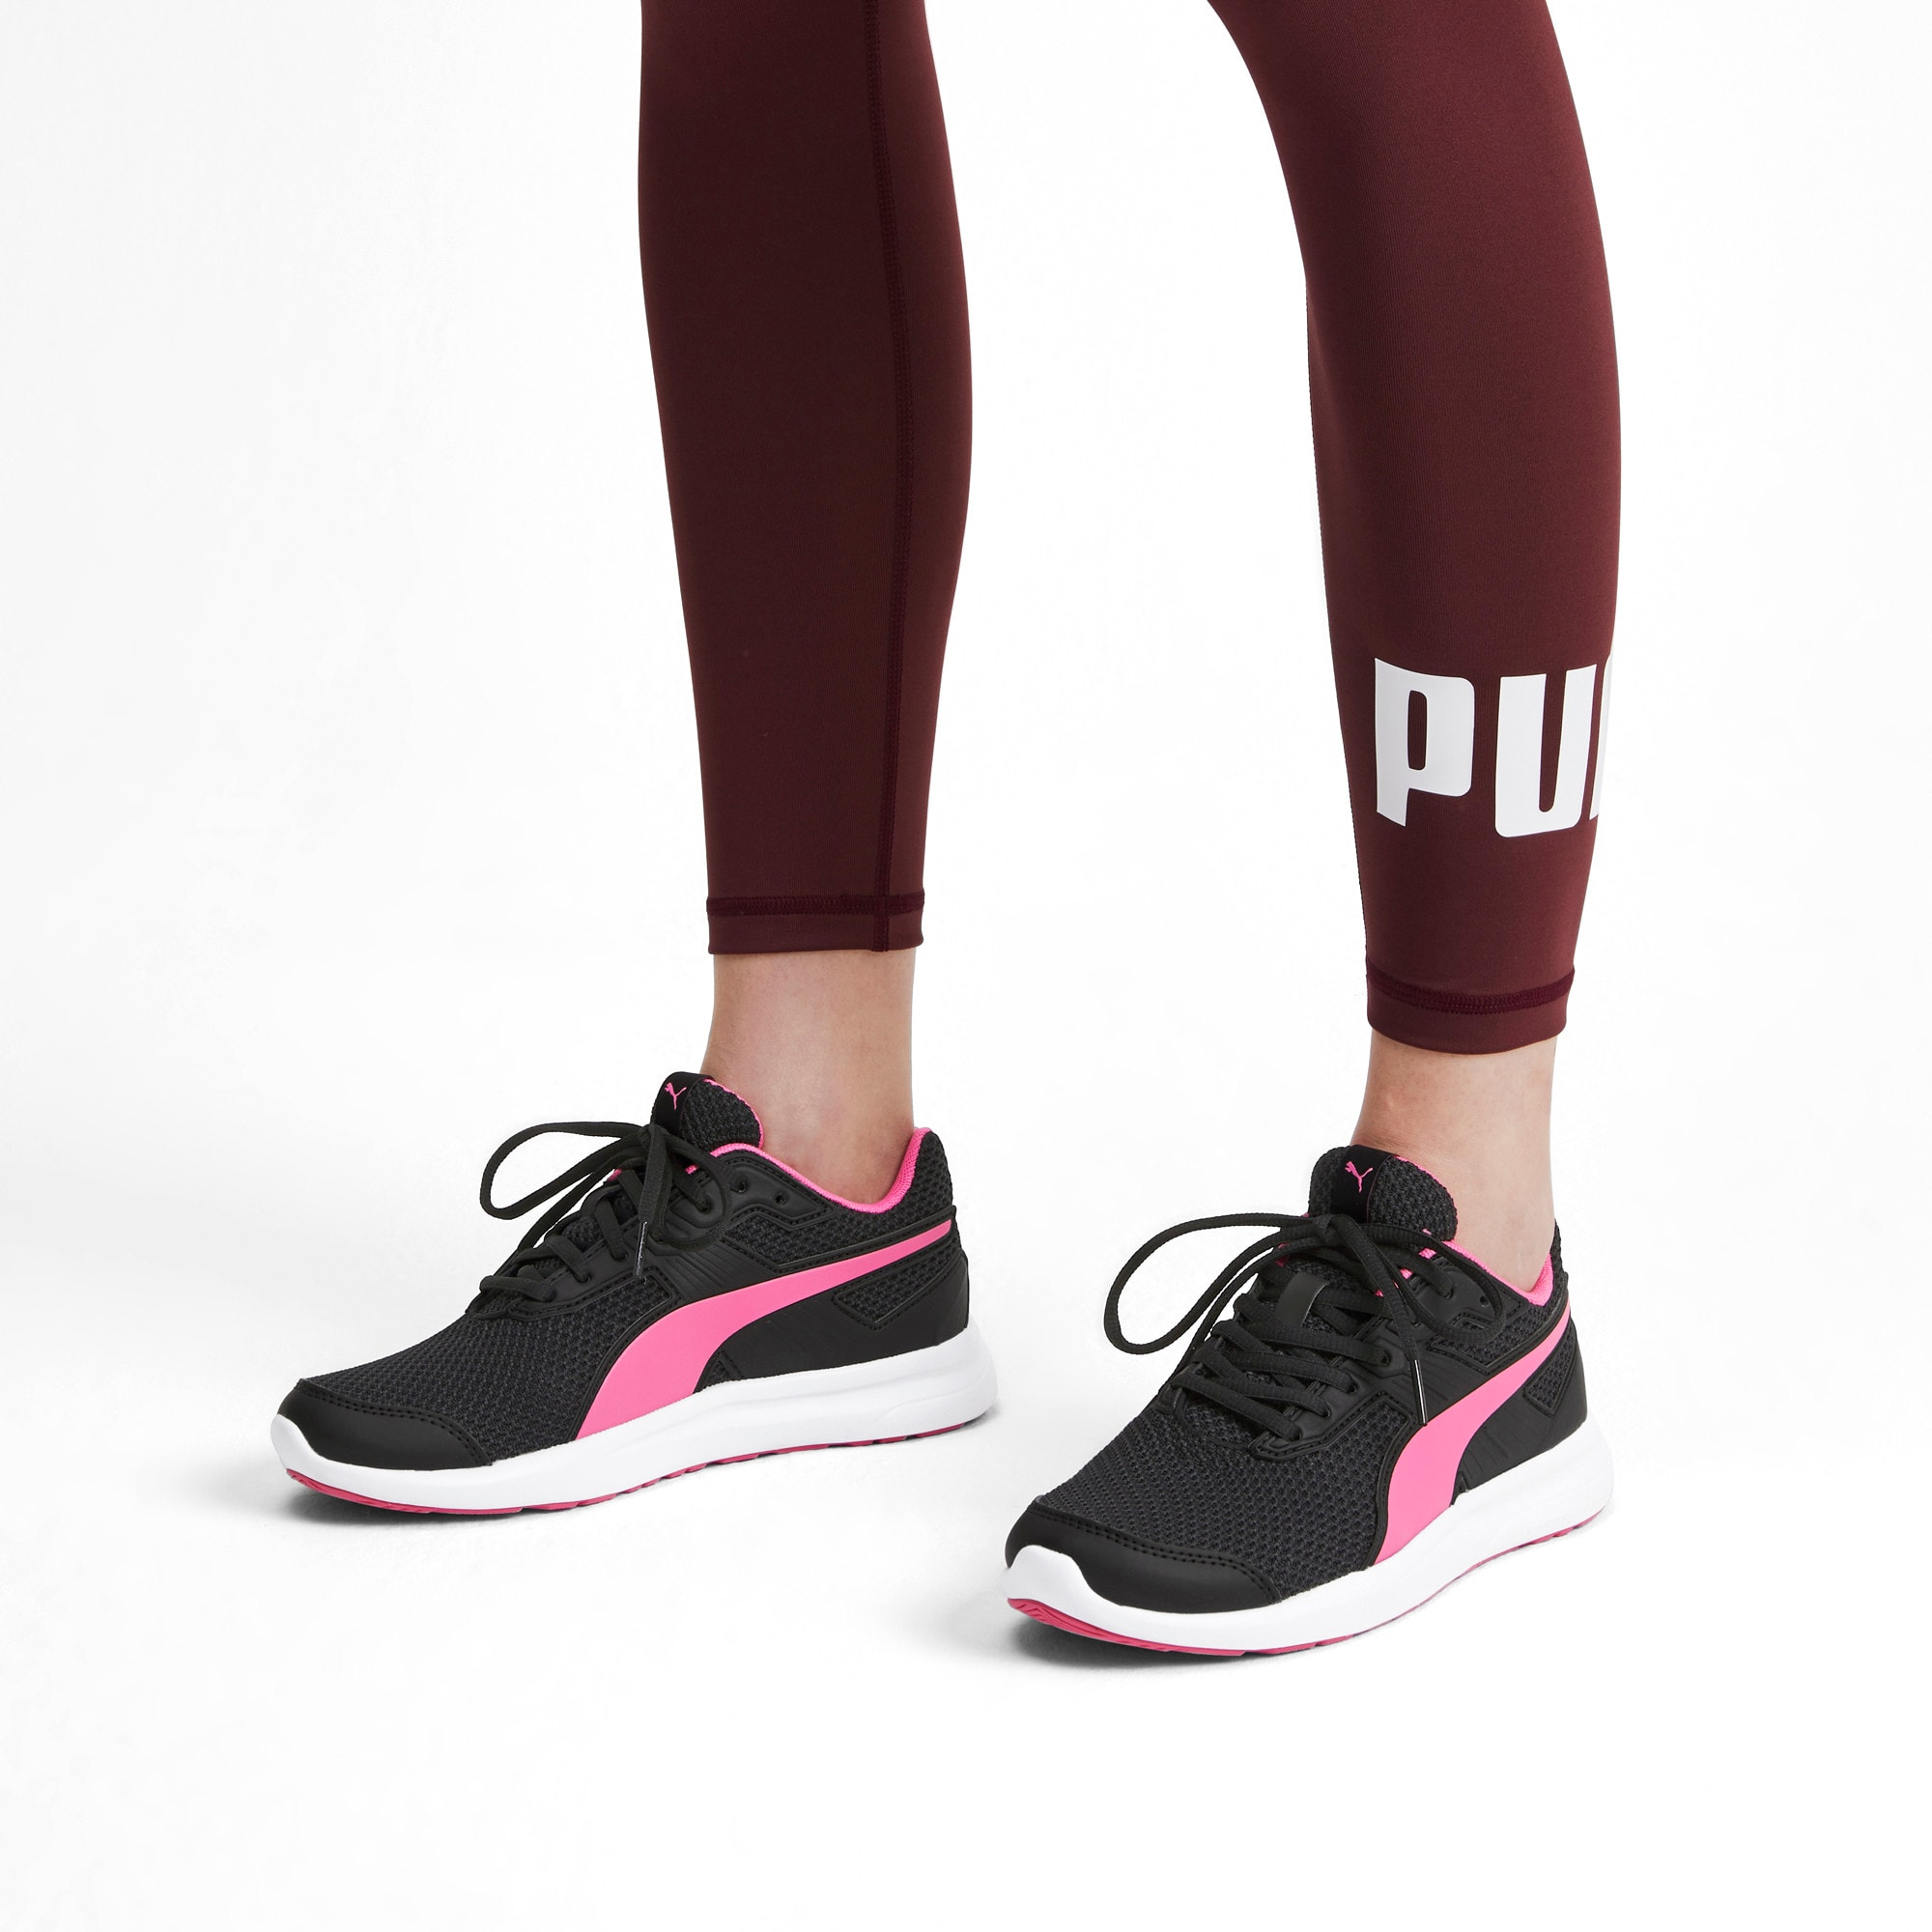 Thumbnail 2 of Escaper Training Shoes, Puma Black-Azalea Pink-White, medium-IND